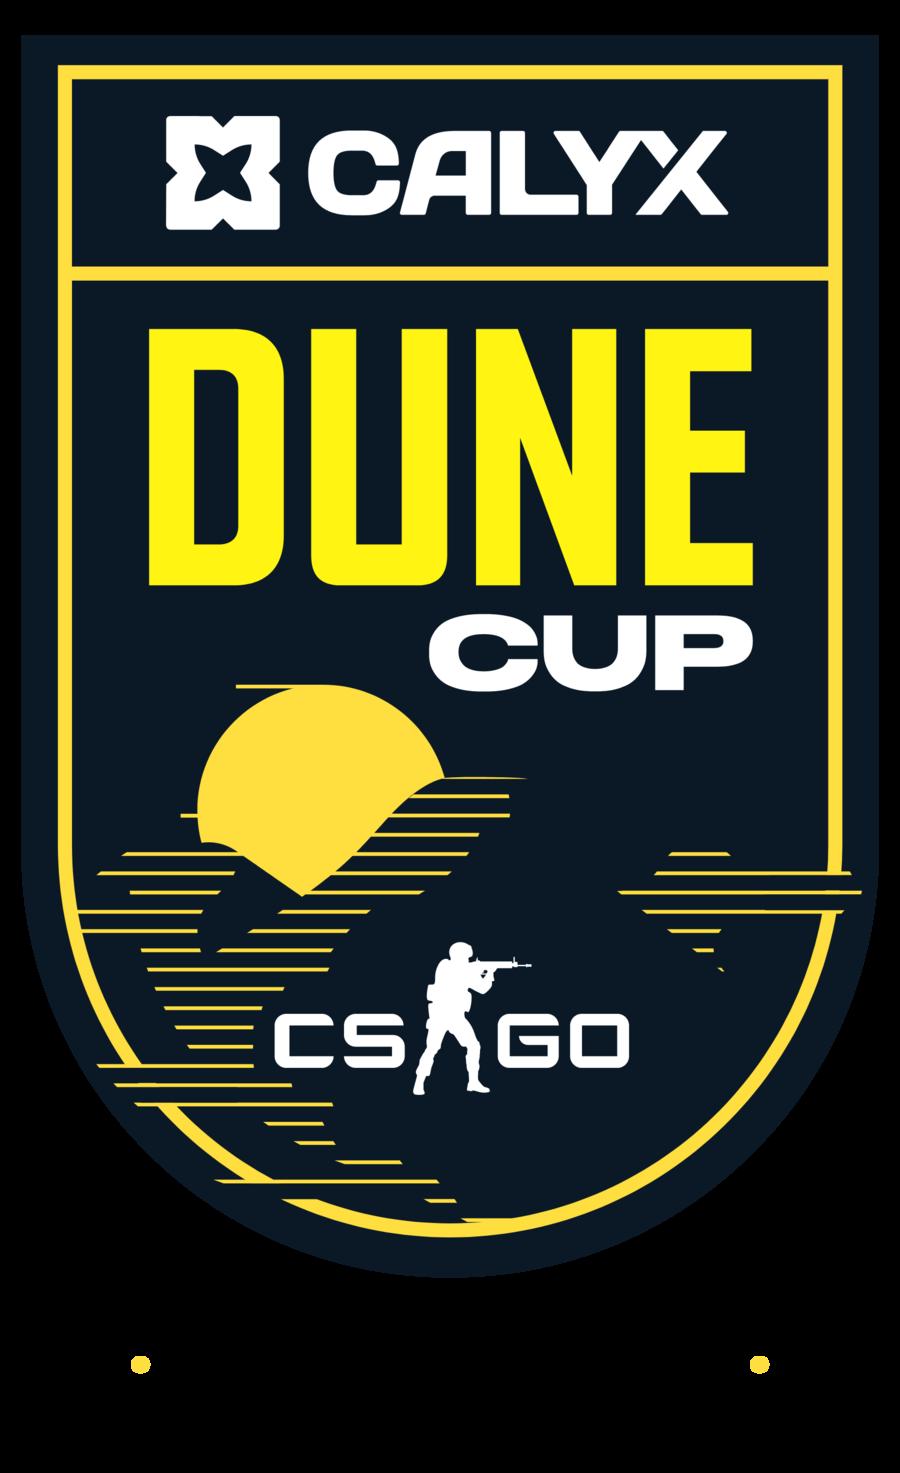 900px calyx dune cup